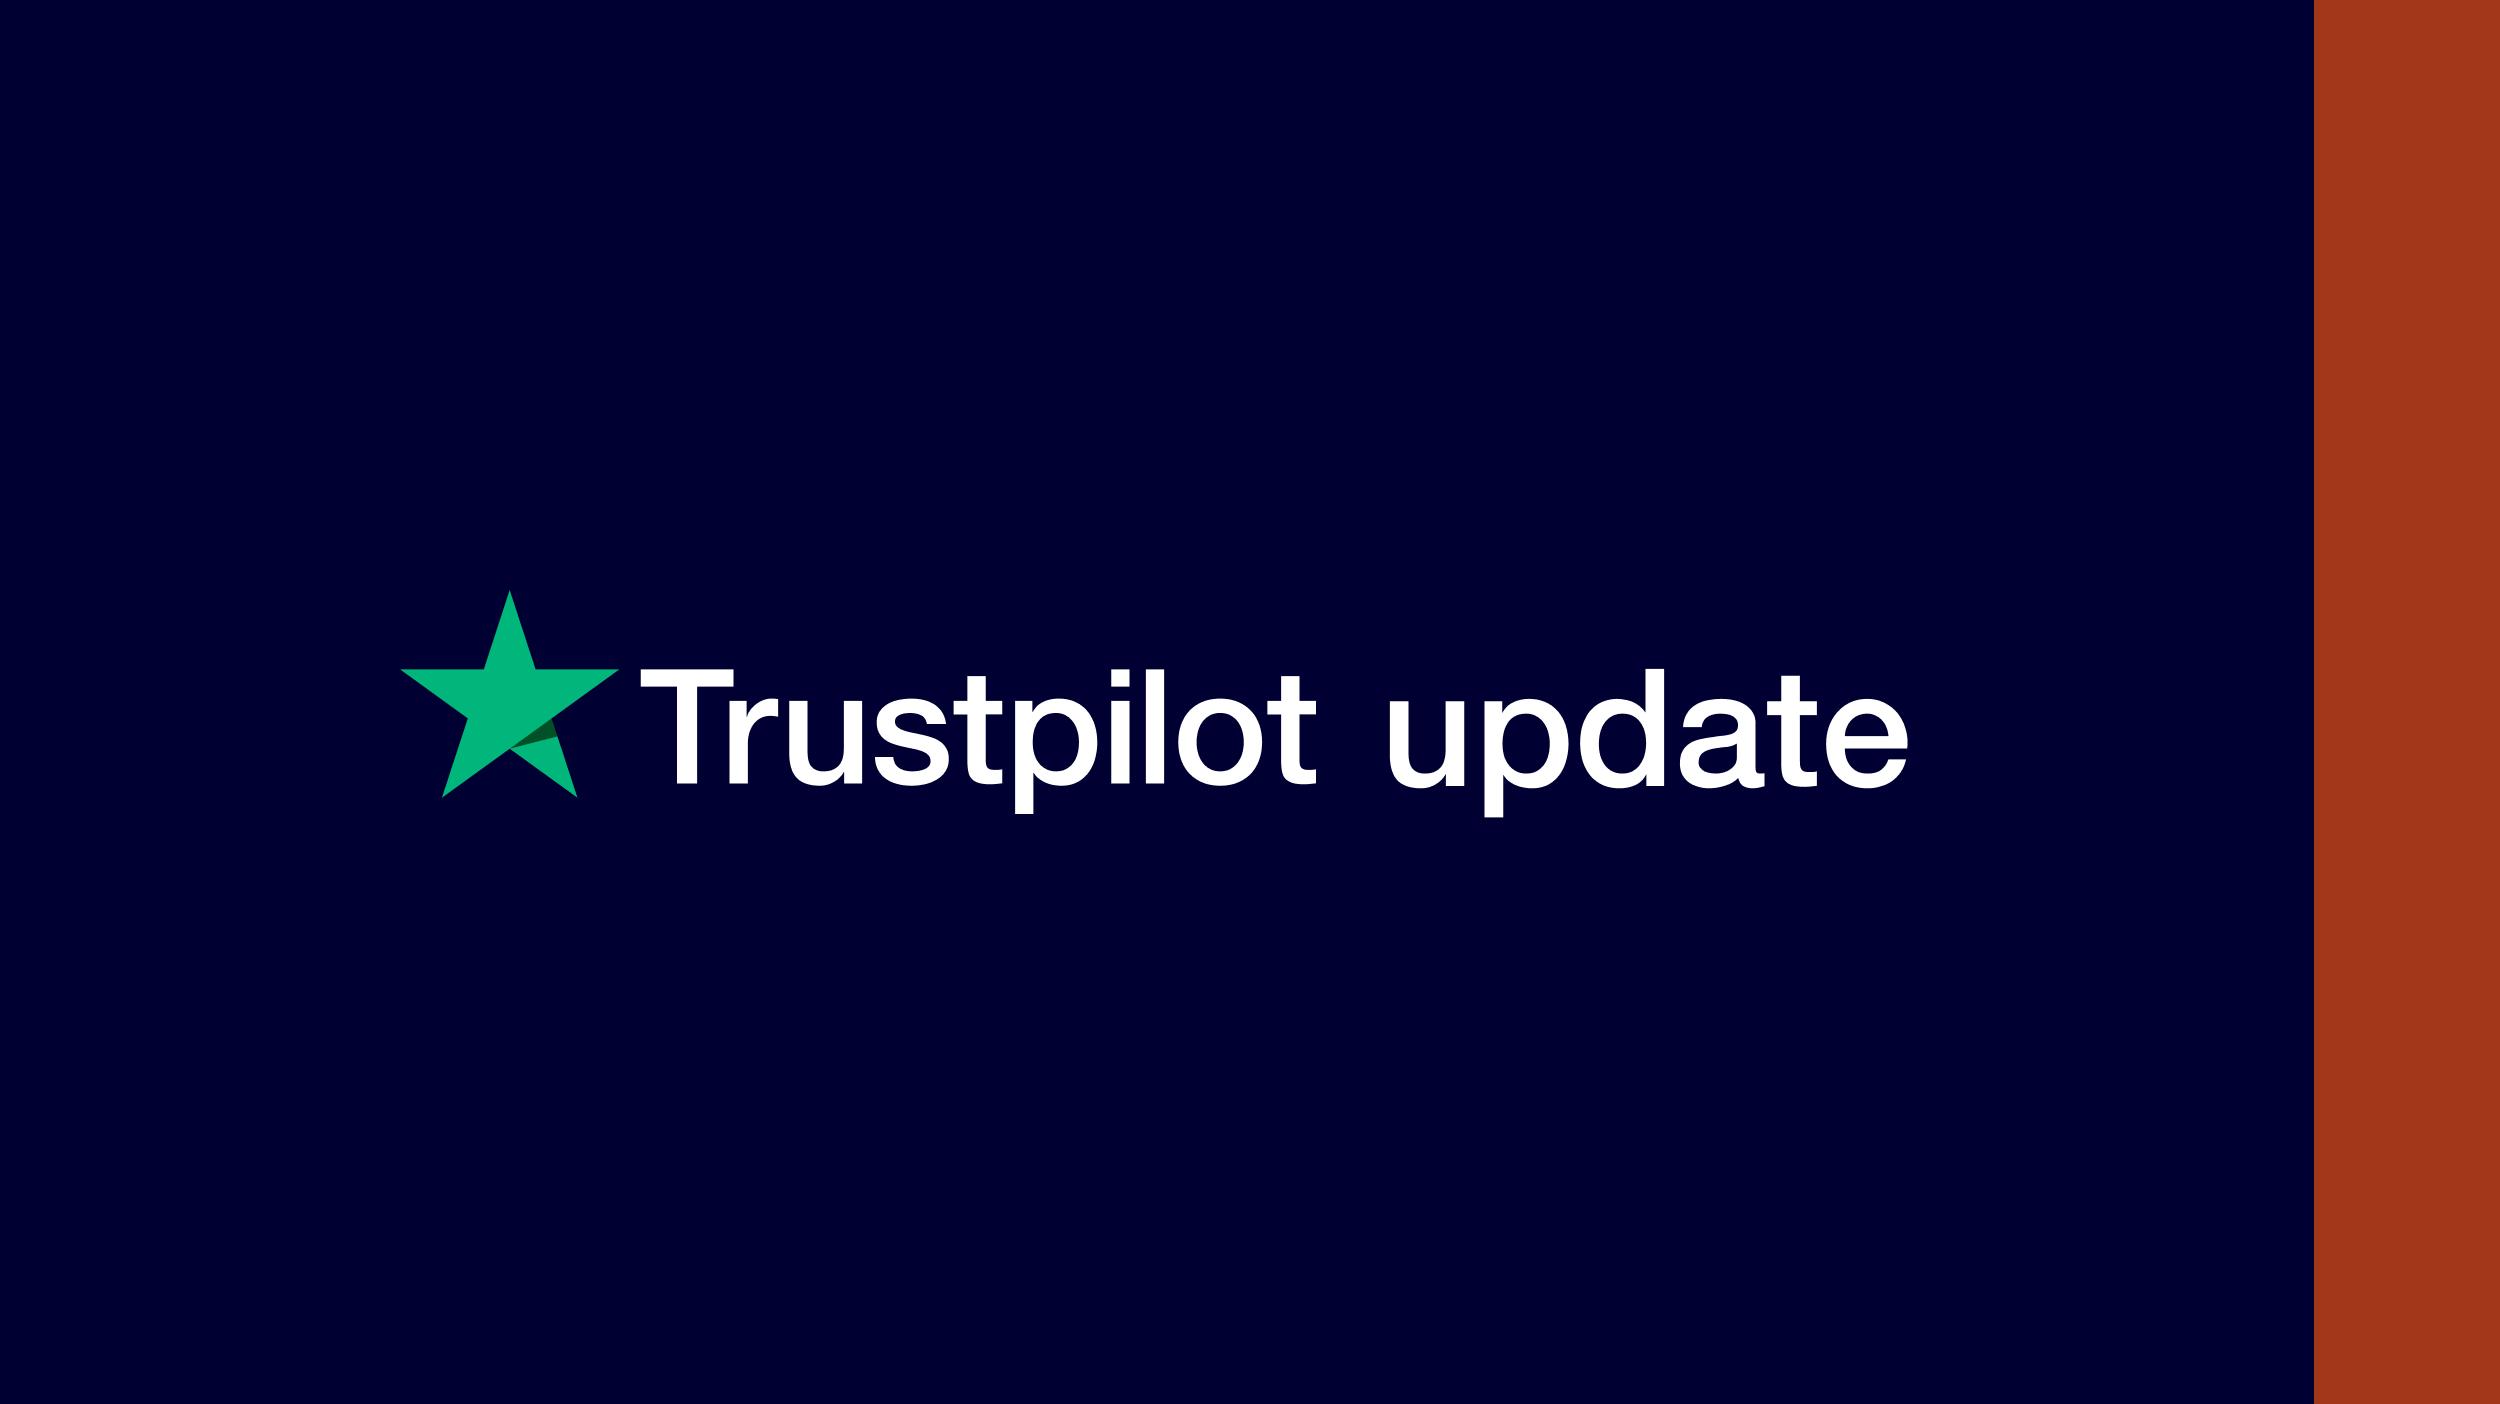 Trustpilot and Klaviyo, partnership announcement